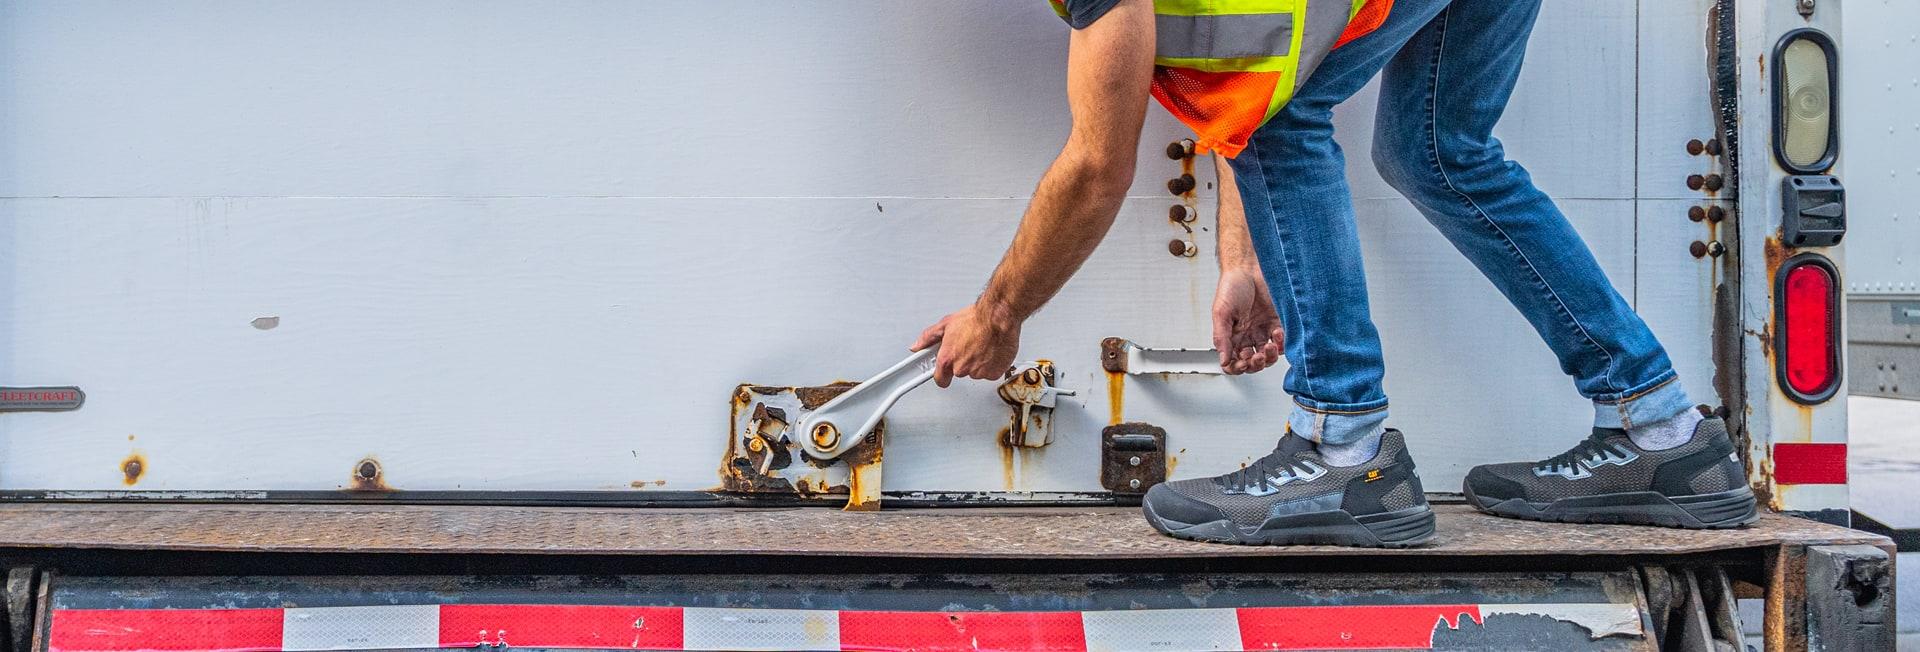 A worker opening a truck door, wearing Cat Sprint work shoes.